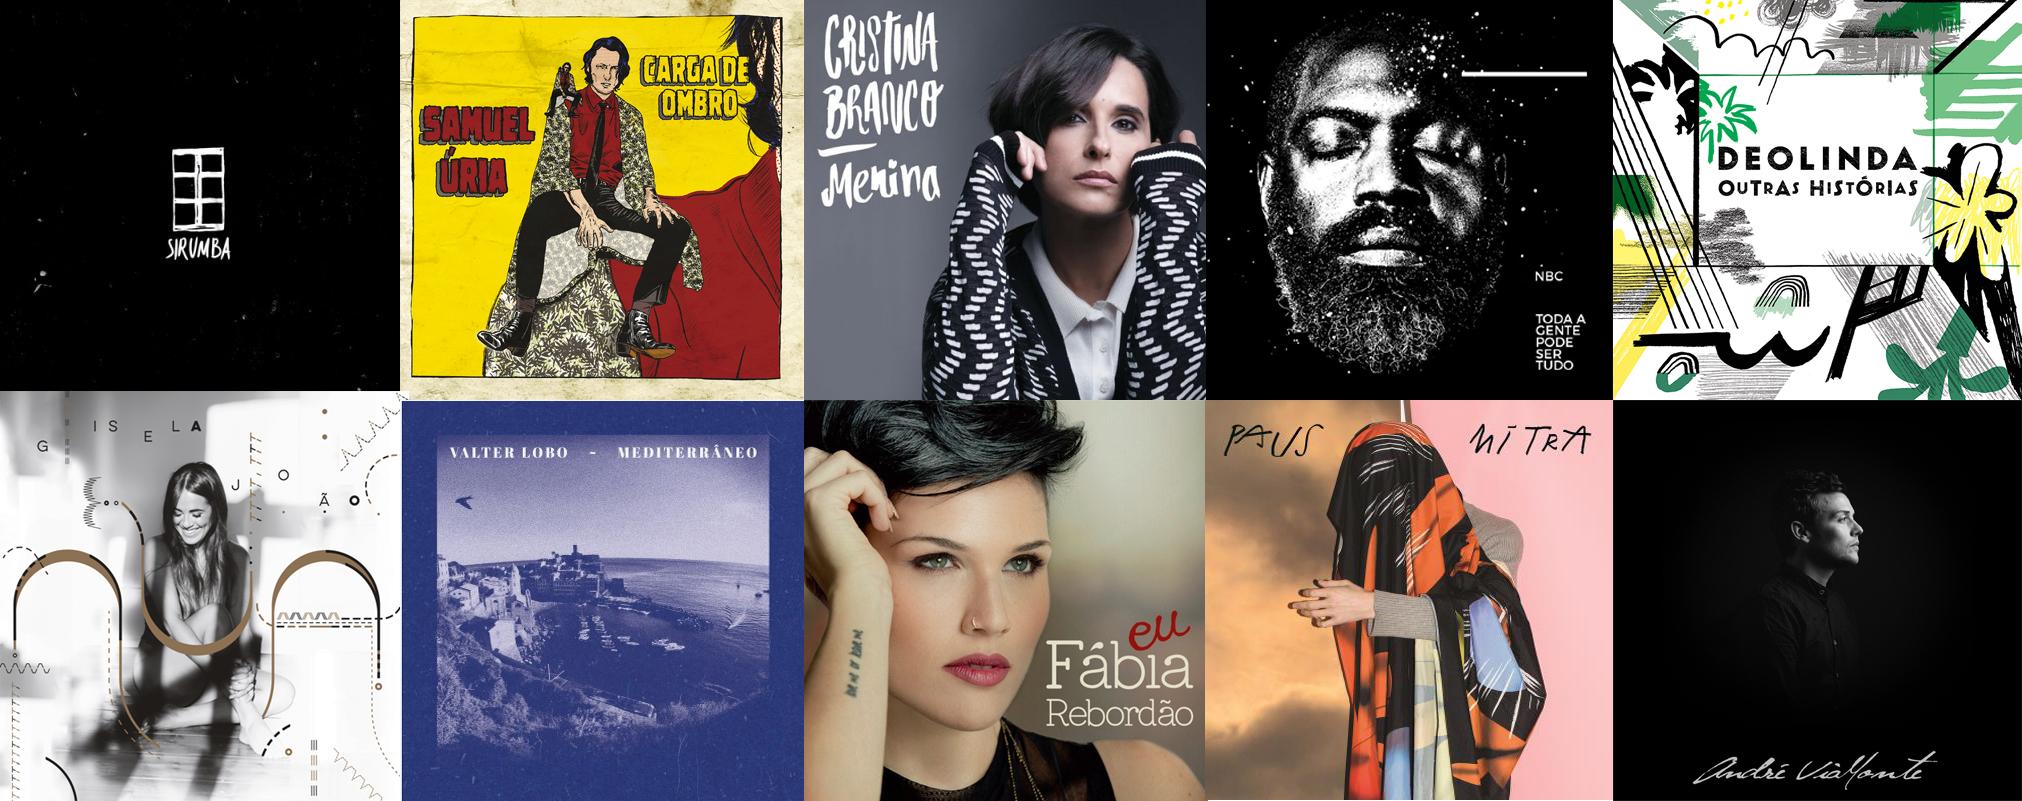 melhores álbuns de 2016